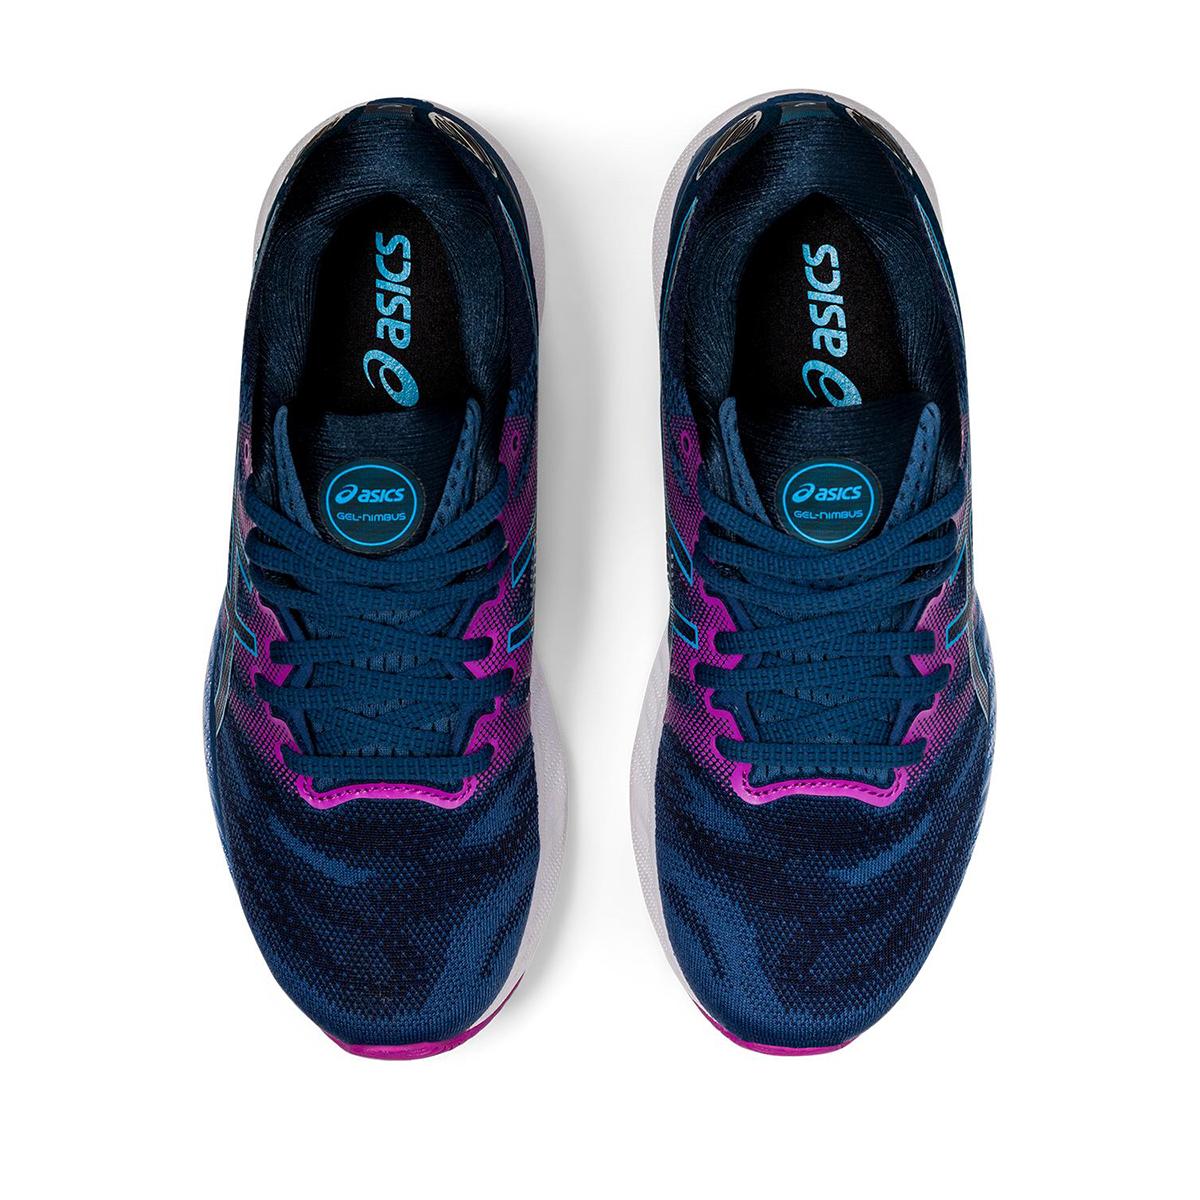 Women's Asics GEL-Nimbus 23 Running Shoe - Color: Grand Shark/Digital Aqua - Size: 5 - Width: Regular, Grand Shark/Digital Aqua, large, image 3